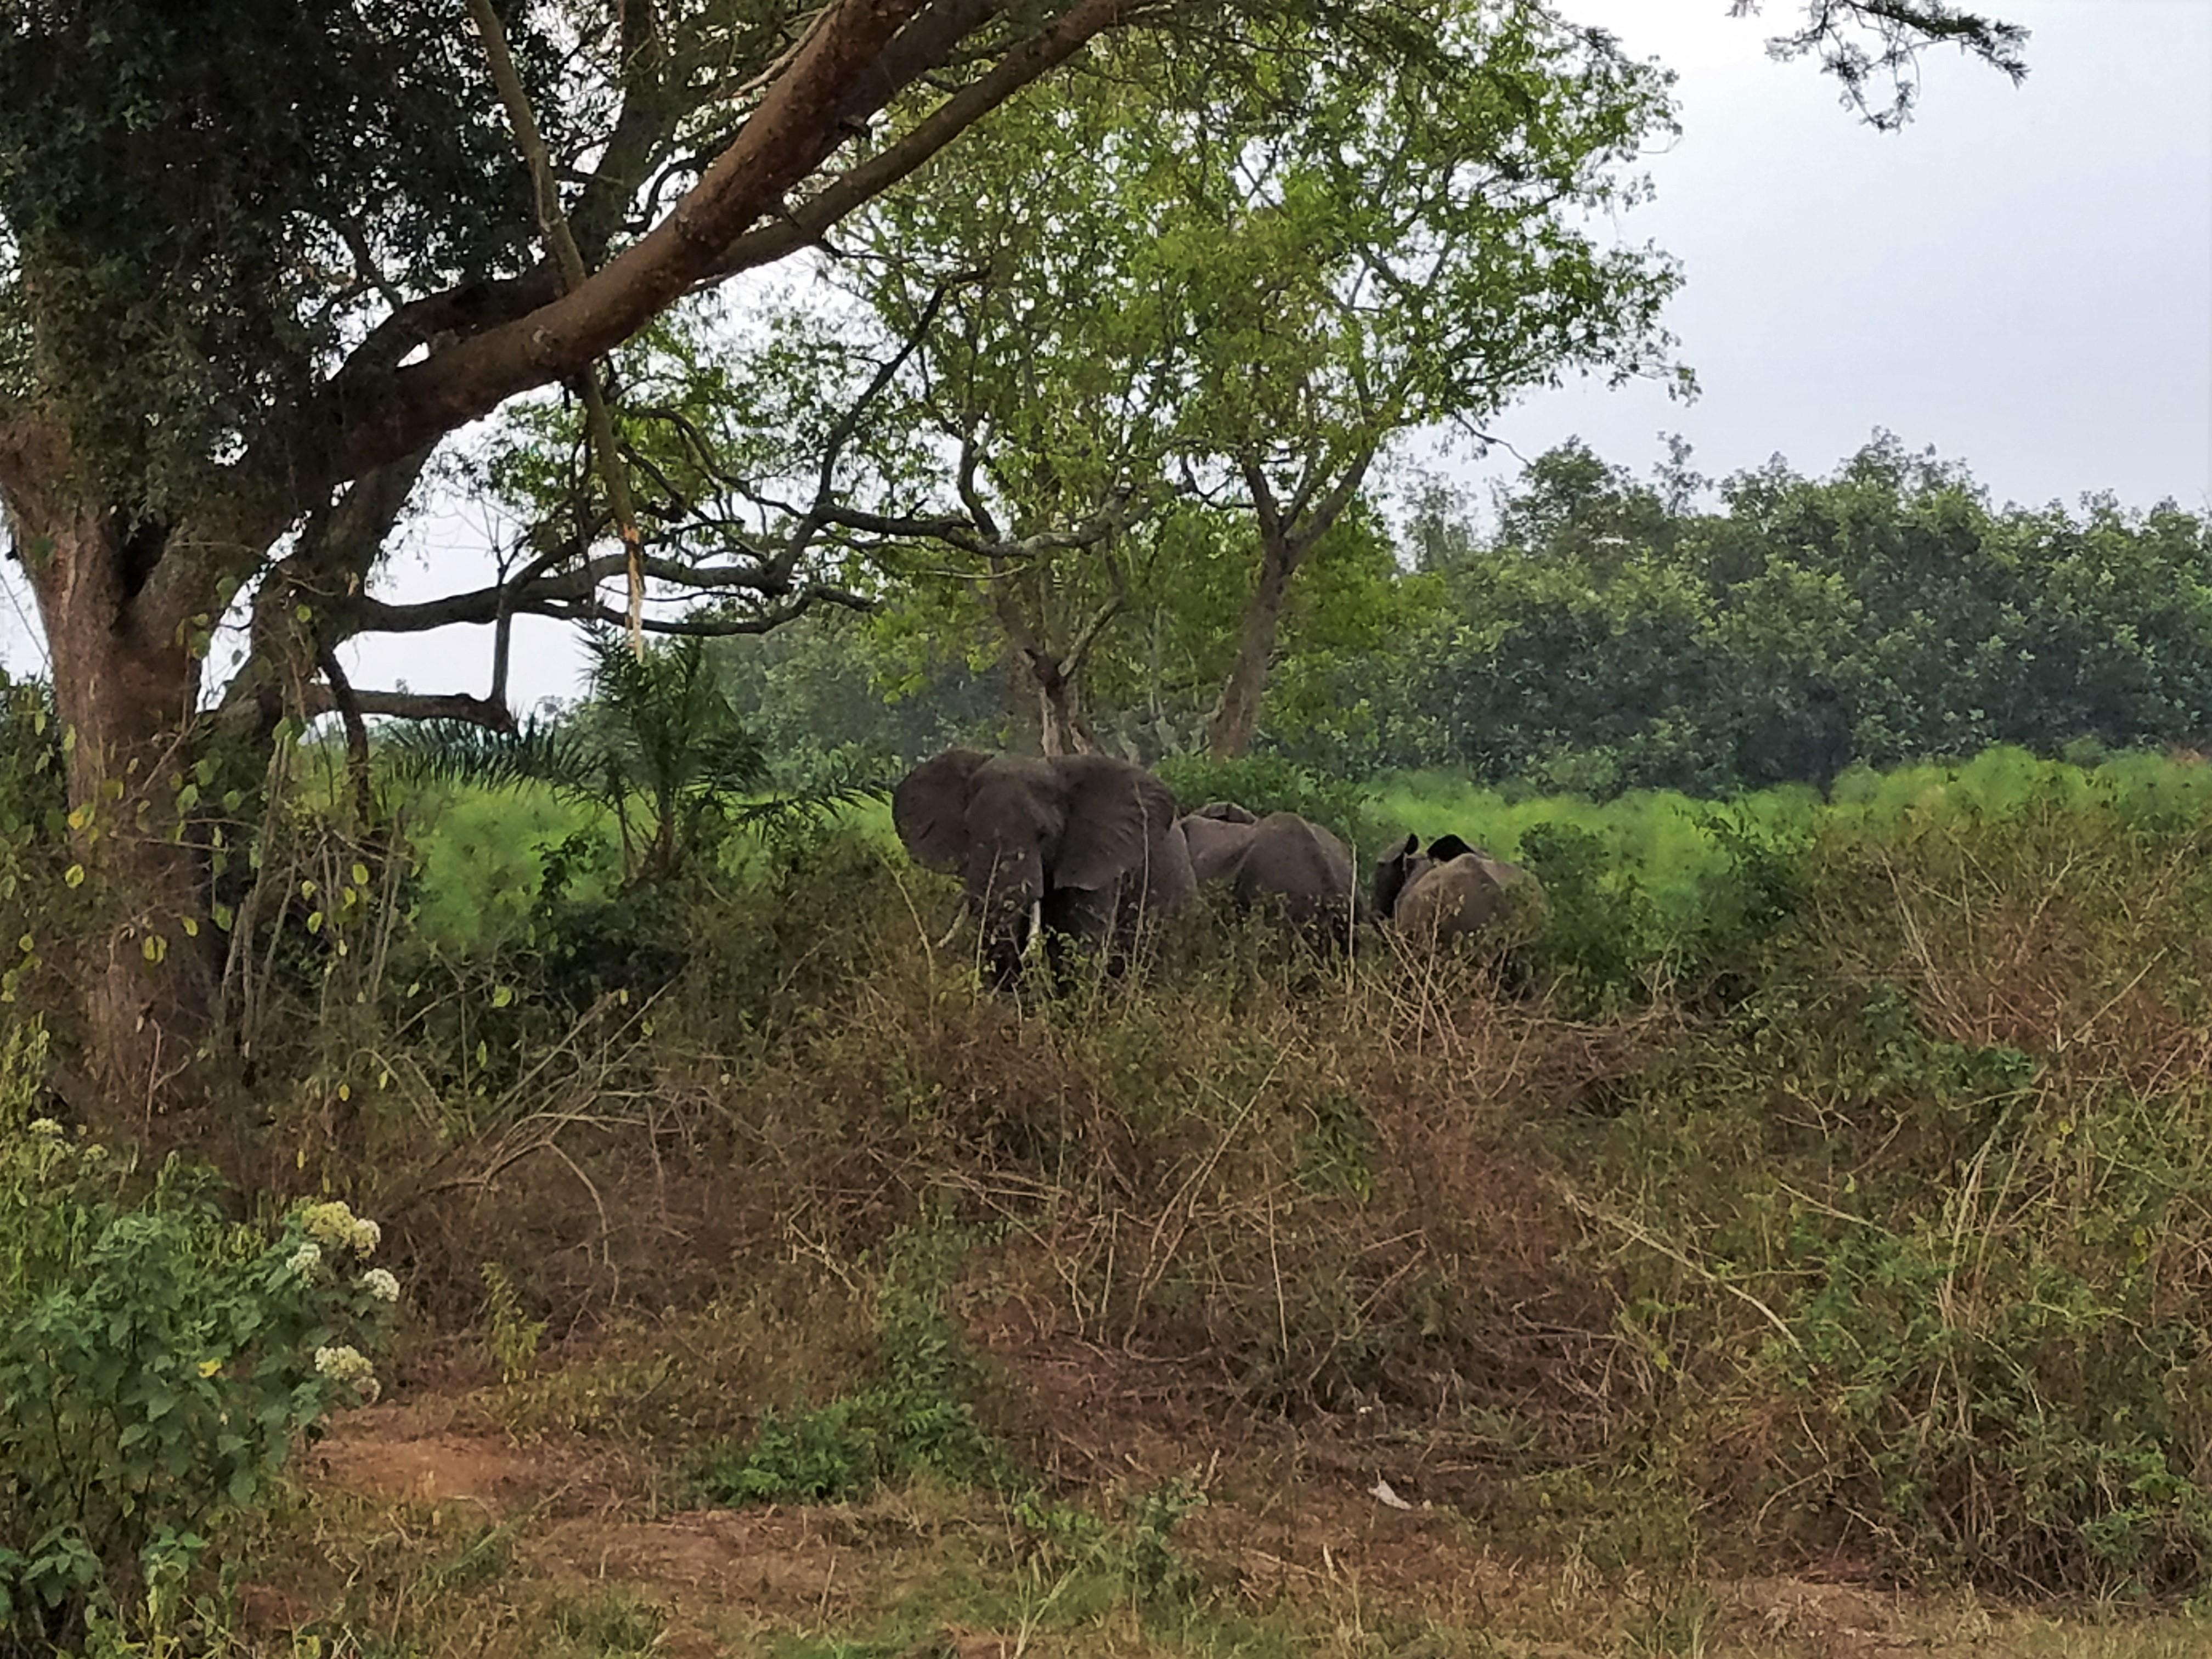 safari, Uganda, Red Chili, elephant, Queen Elizabeth National Park